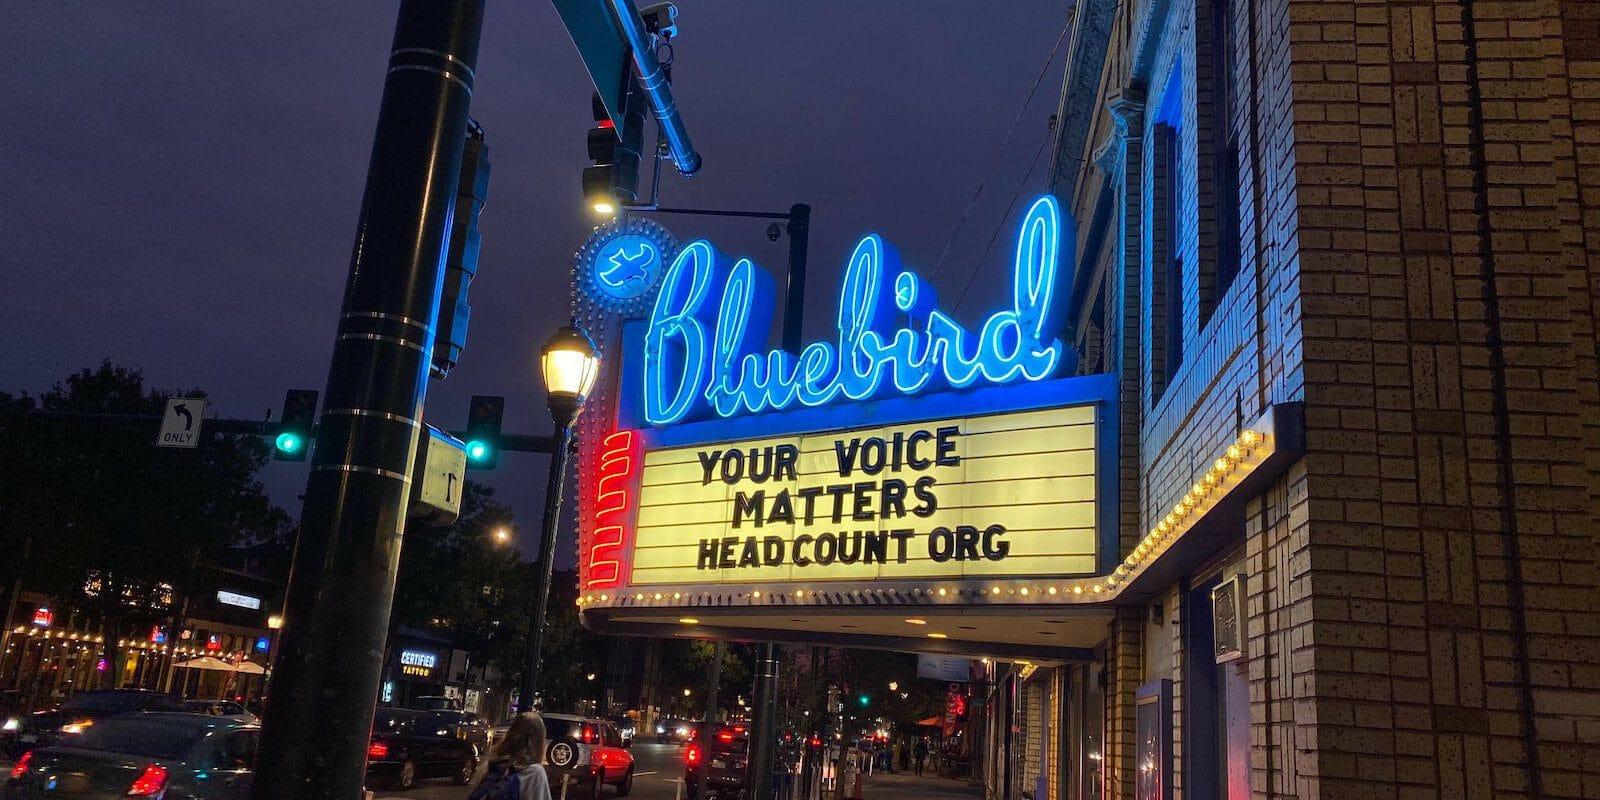 Image of Bluebird Theater's illuminated sign in Denver, Colorado